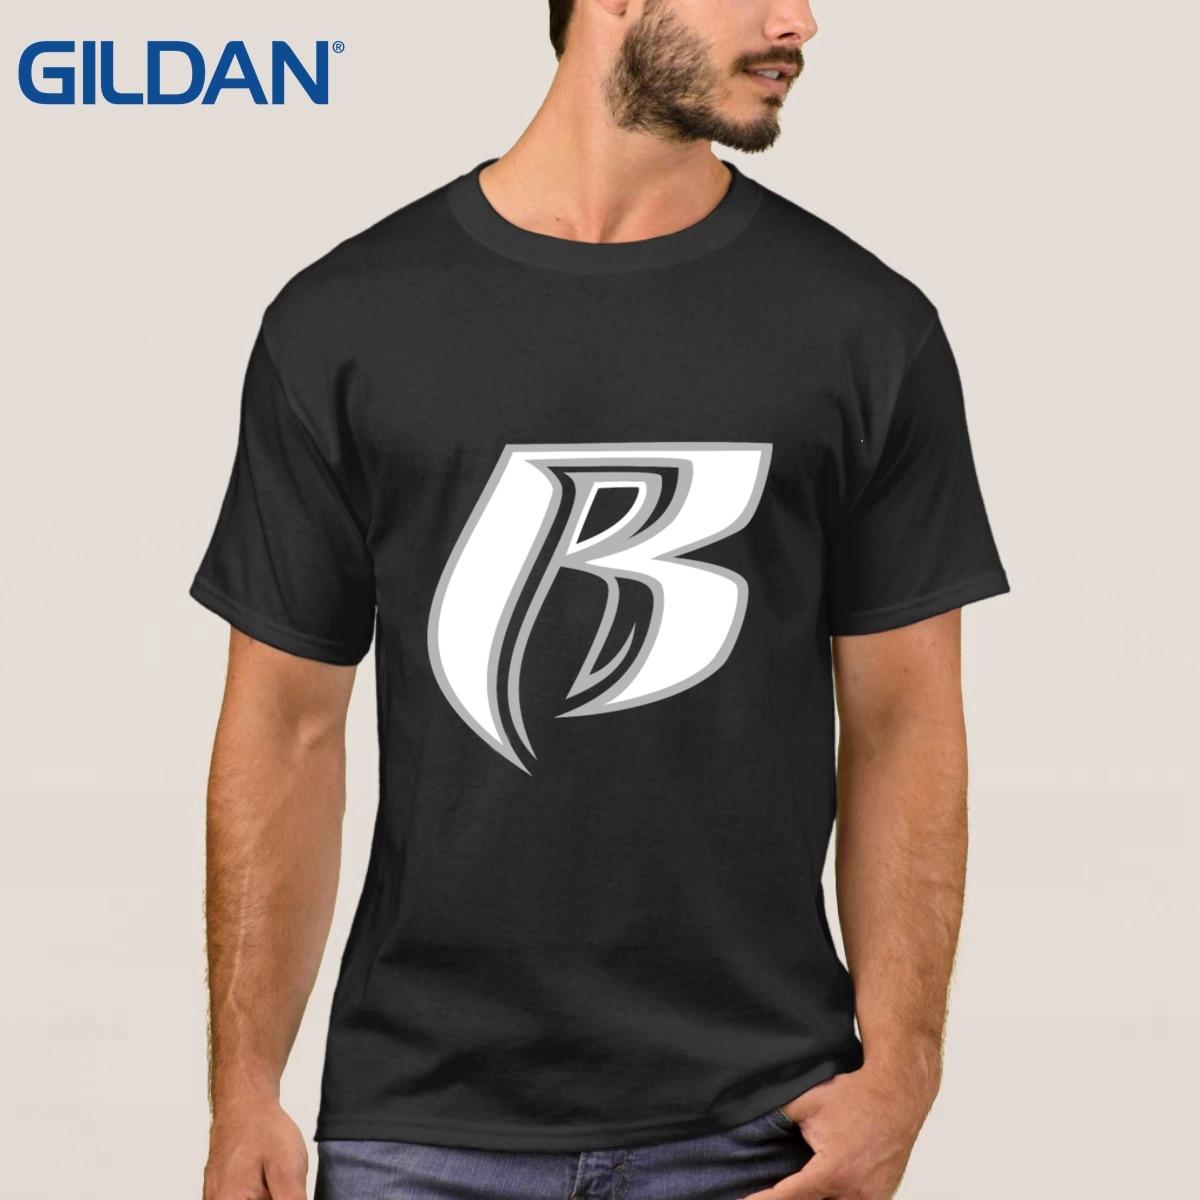 T Shirt Black Men Ruff Ryders Rao Label High Hop Short Sleeved On Sale Clothes S